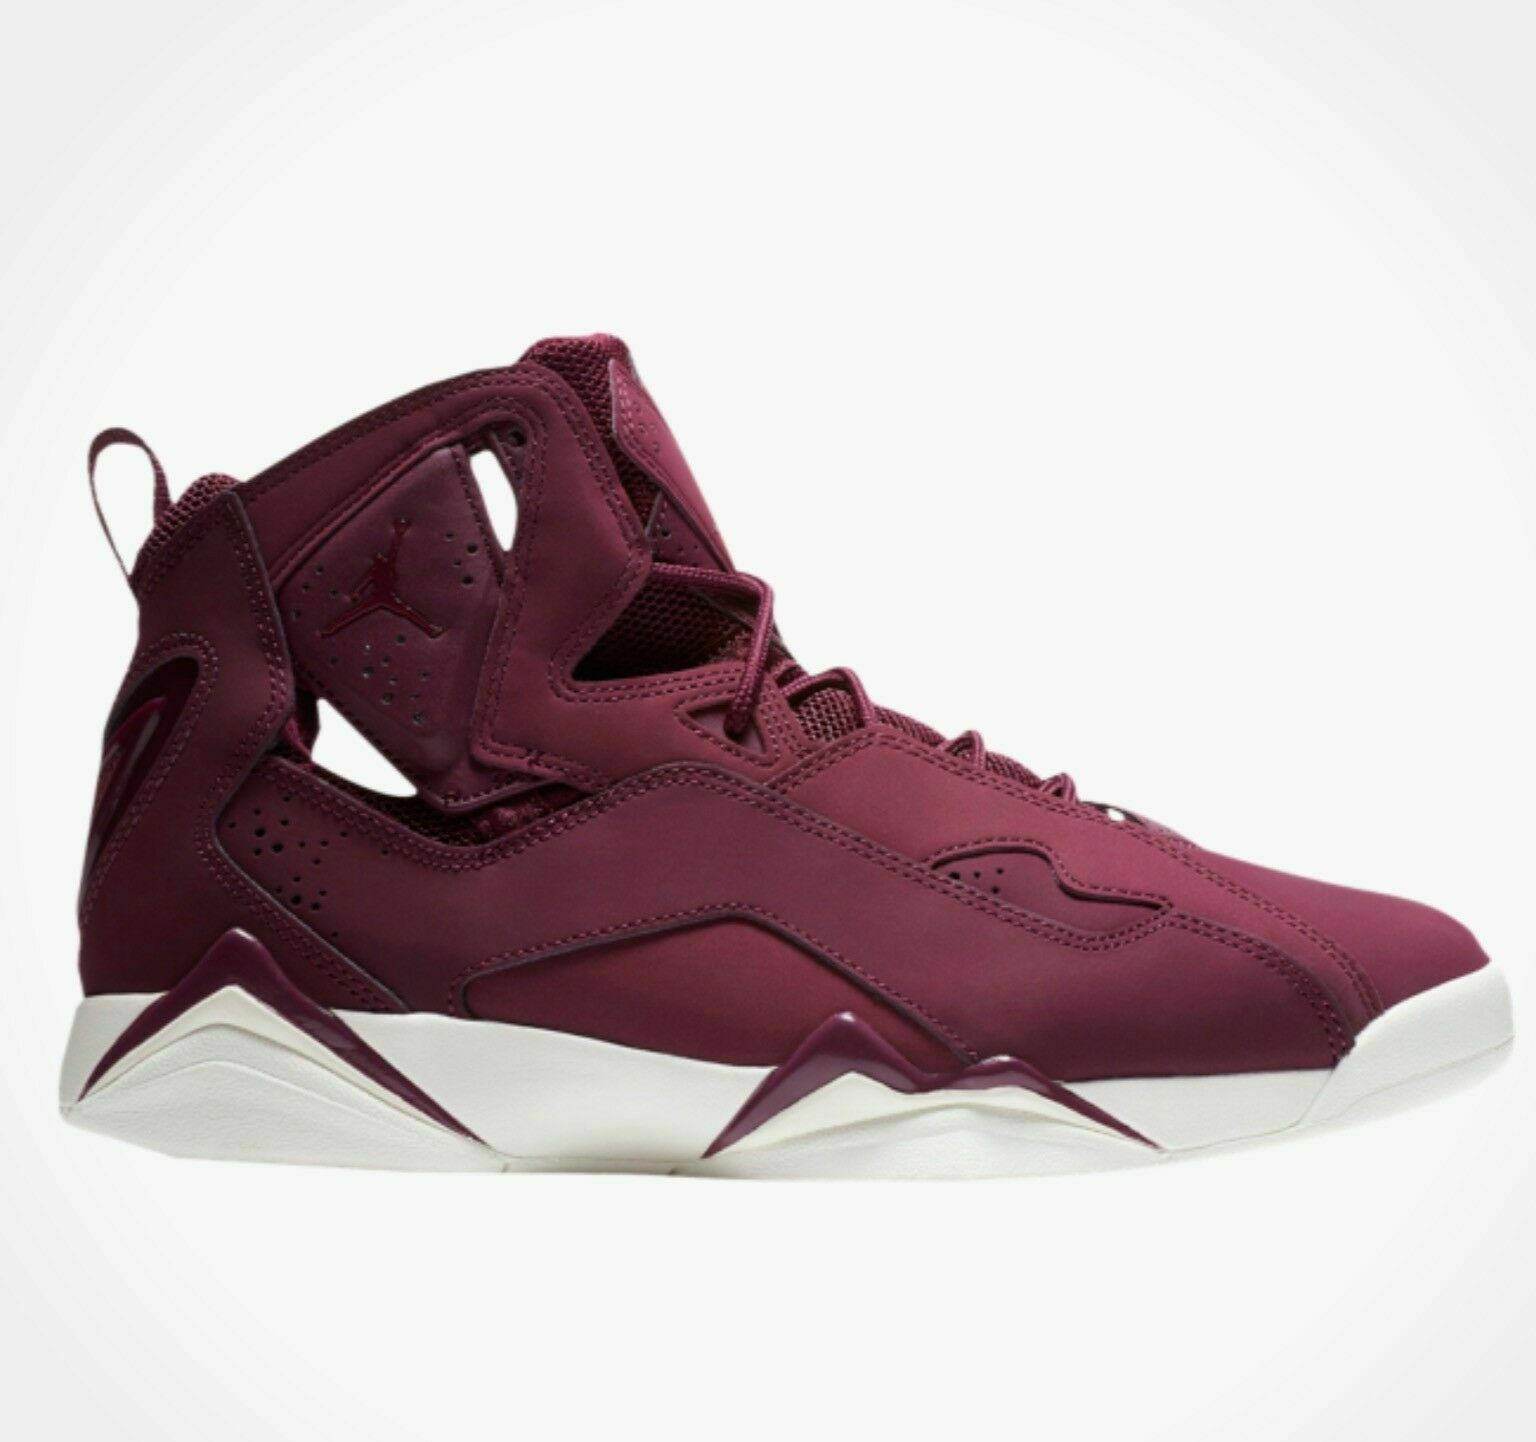 a278ea9788b09 NIKE Jordan True Flight Men s Basketball shoes 342964-625 sz 10.5 11 11.5  12 13 npbwri5426-Athletic Shoes. Melanargia galathea. MENS ADIDAS PUREBOOST  ...